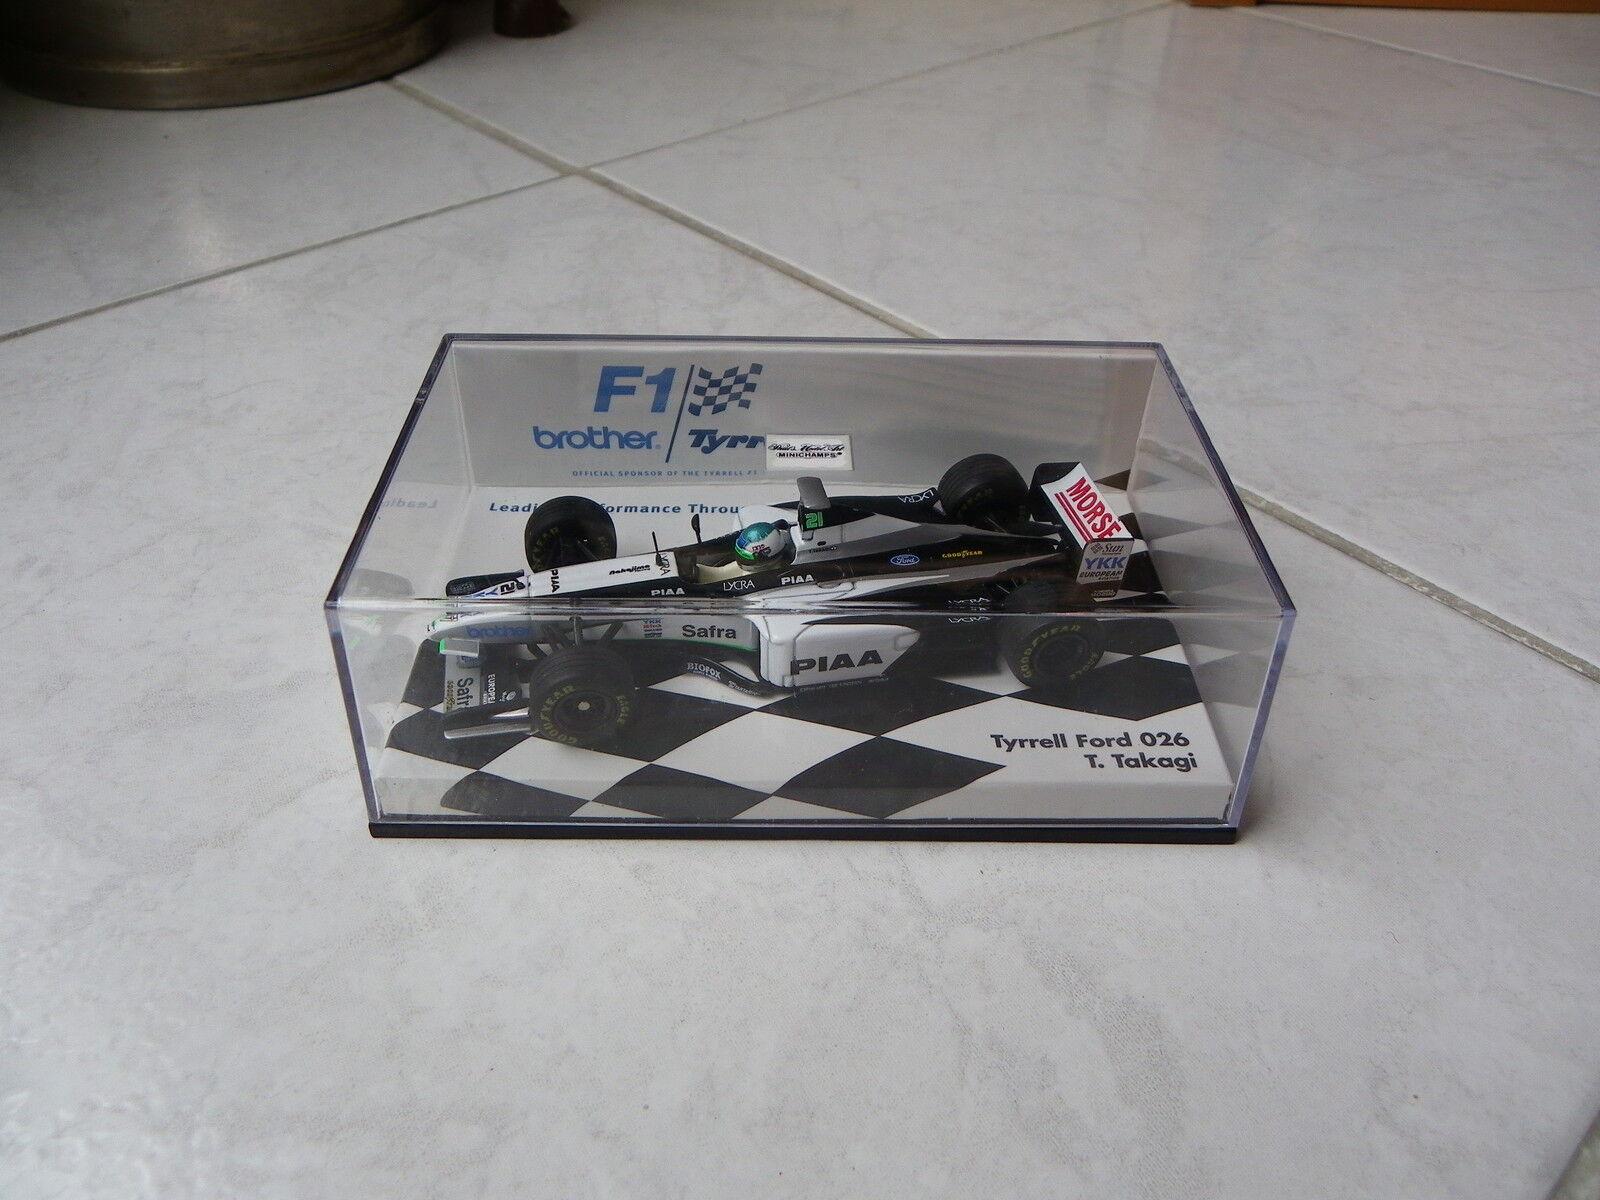 Tora Ford N°21 Minichamps 43 Tyrrell Formule Takagi F1 Box 1 1998 54ALRj3